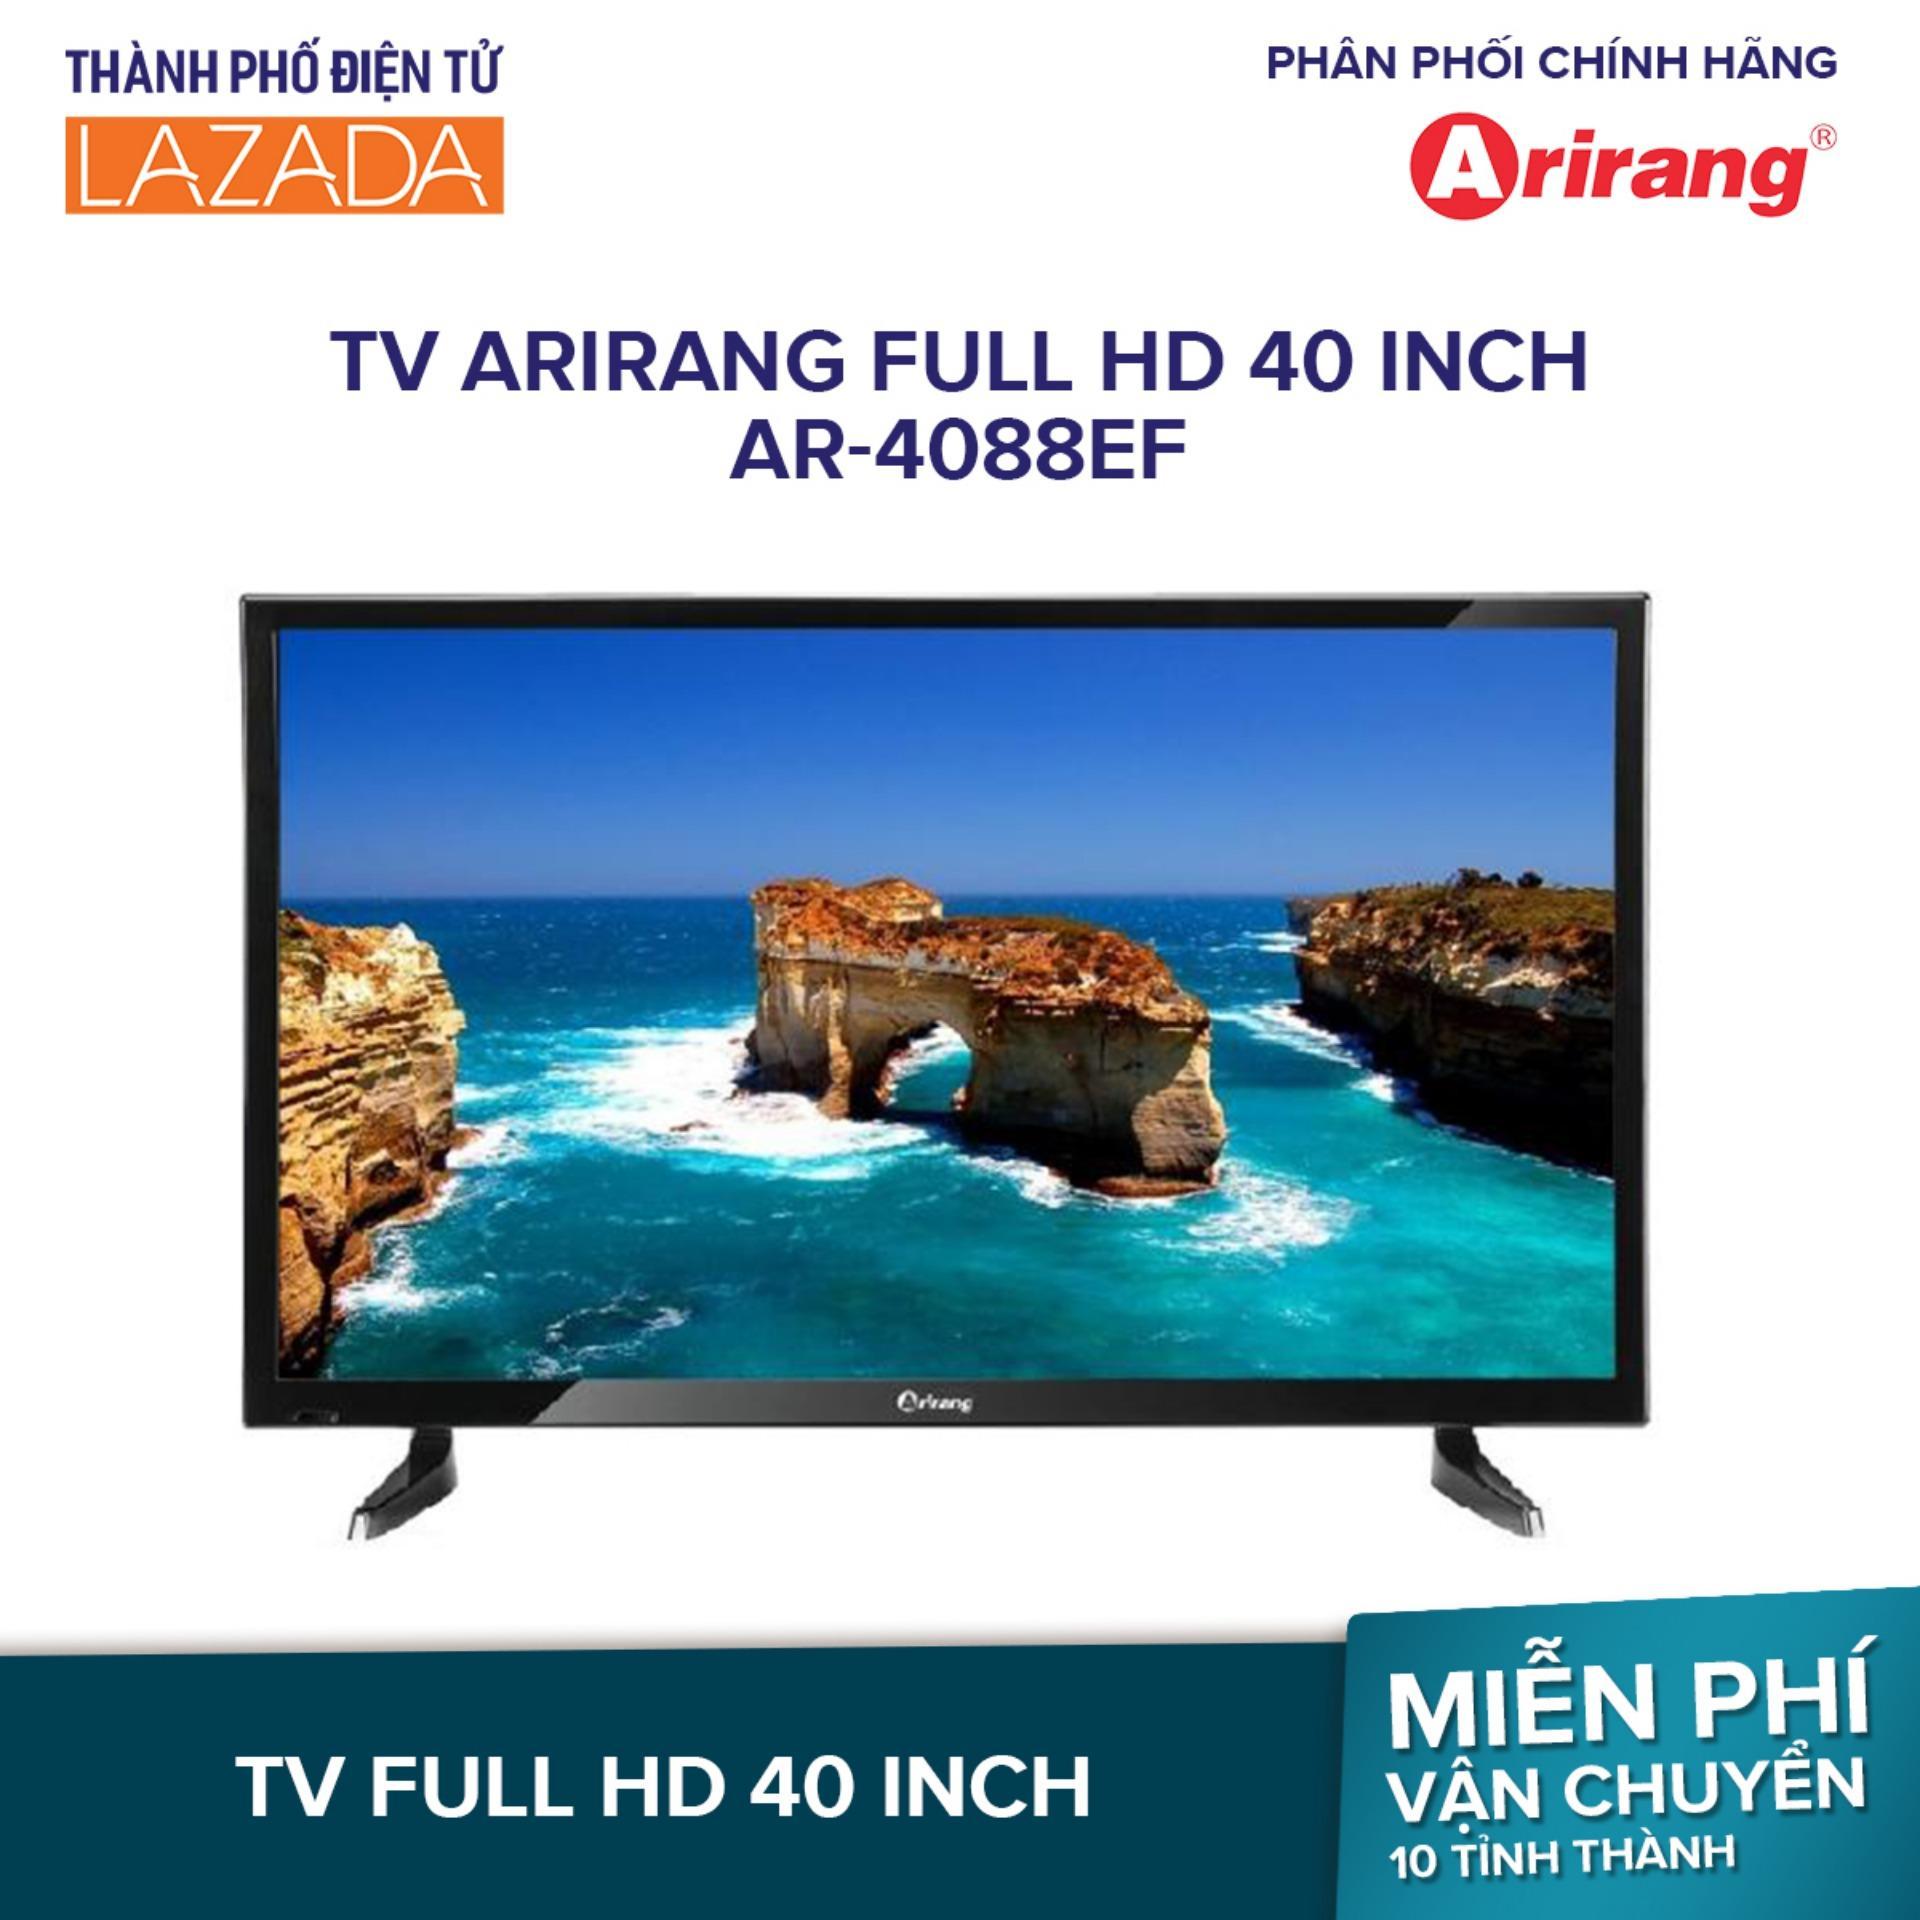 Bảng giá TV Arirang full HD 40 inch AR-4088EF